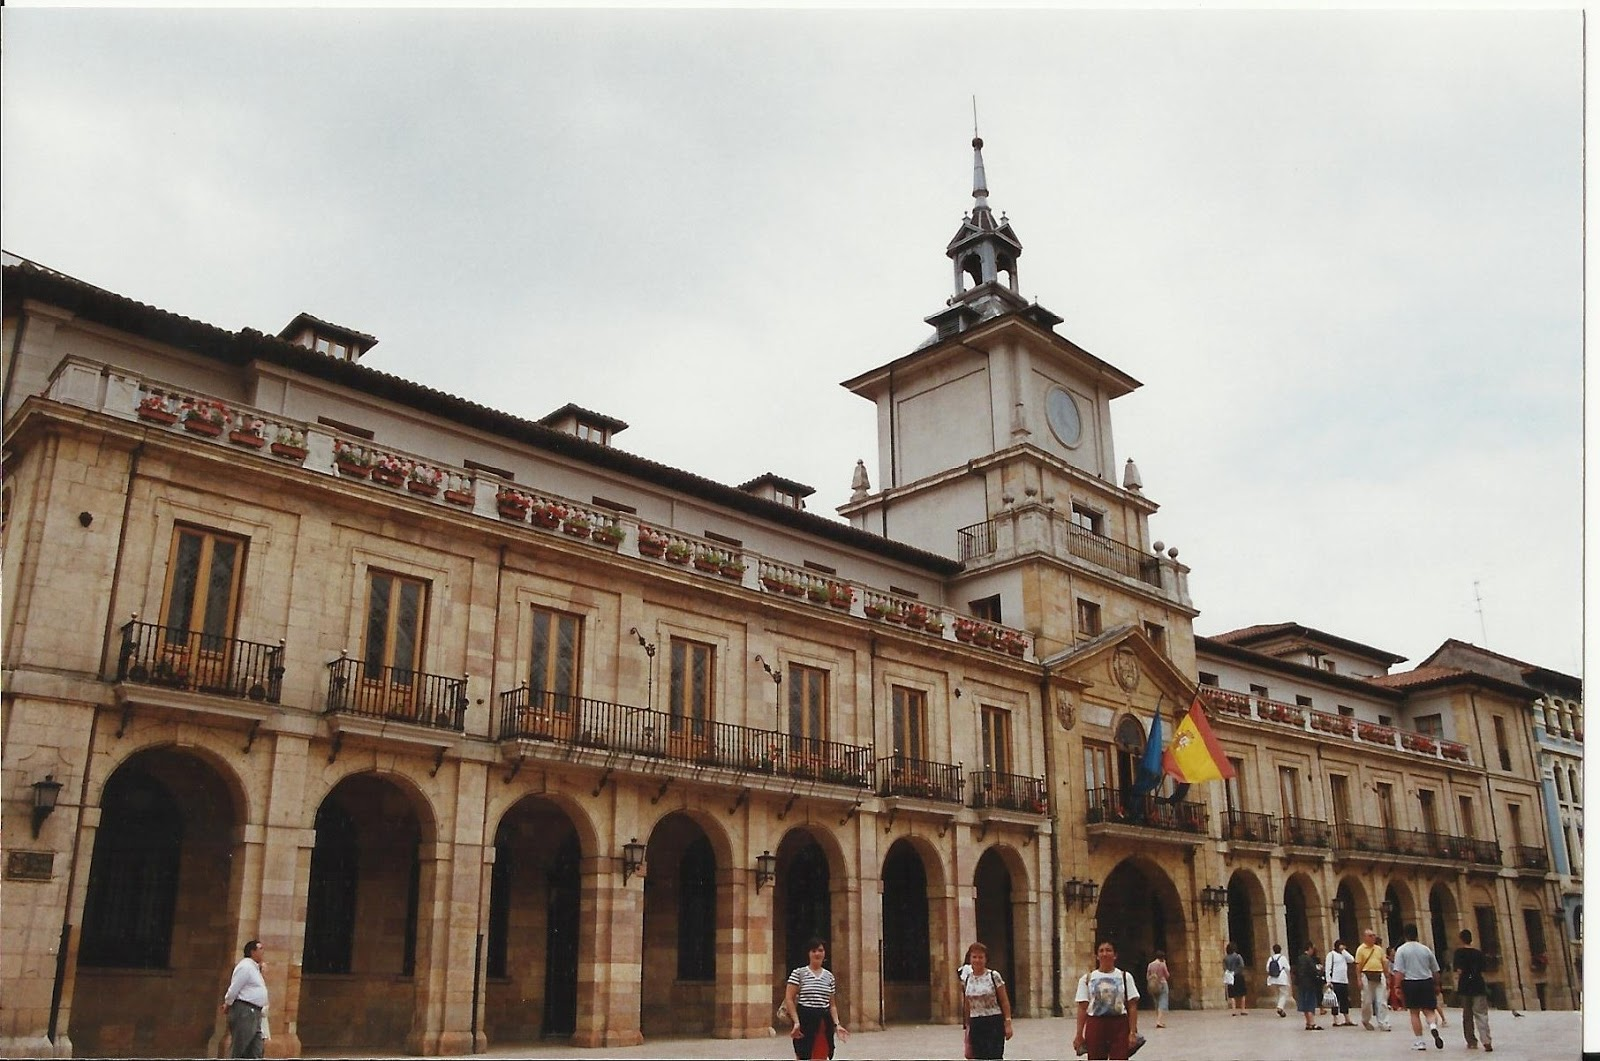 http://4.bp.blogspot.com/-zDbsNMJDbDo/TnN-T41O6aI/AAAAAAAABRI/nS7aWLJ9mvs/s1600/Ayuntamiento+de+Oviedo.jpg